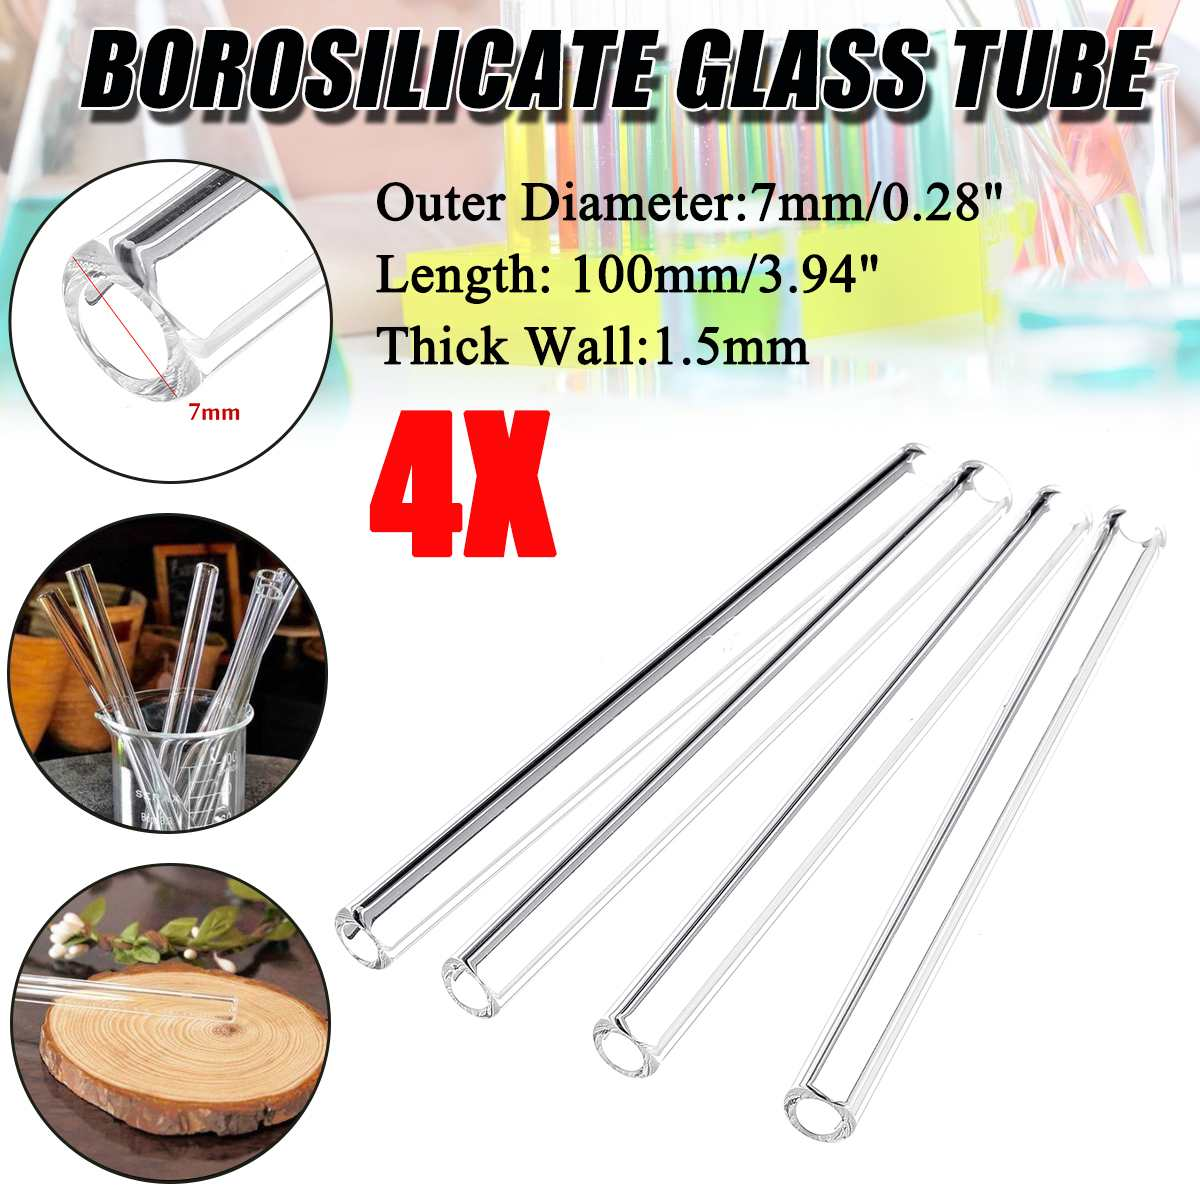 Glass Blowing Tube  4Pcs 100mm OD 7mm 1.5mm Thick Wall Borosilicate Lab Tubing School Factory Laborator